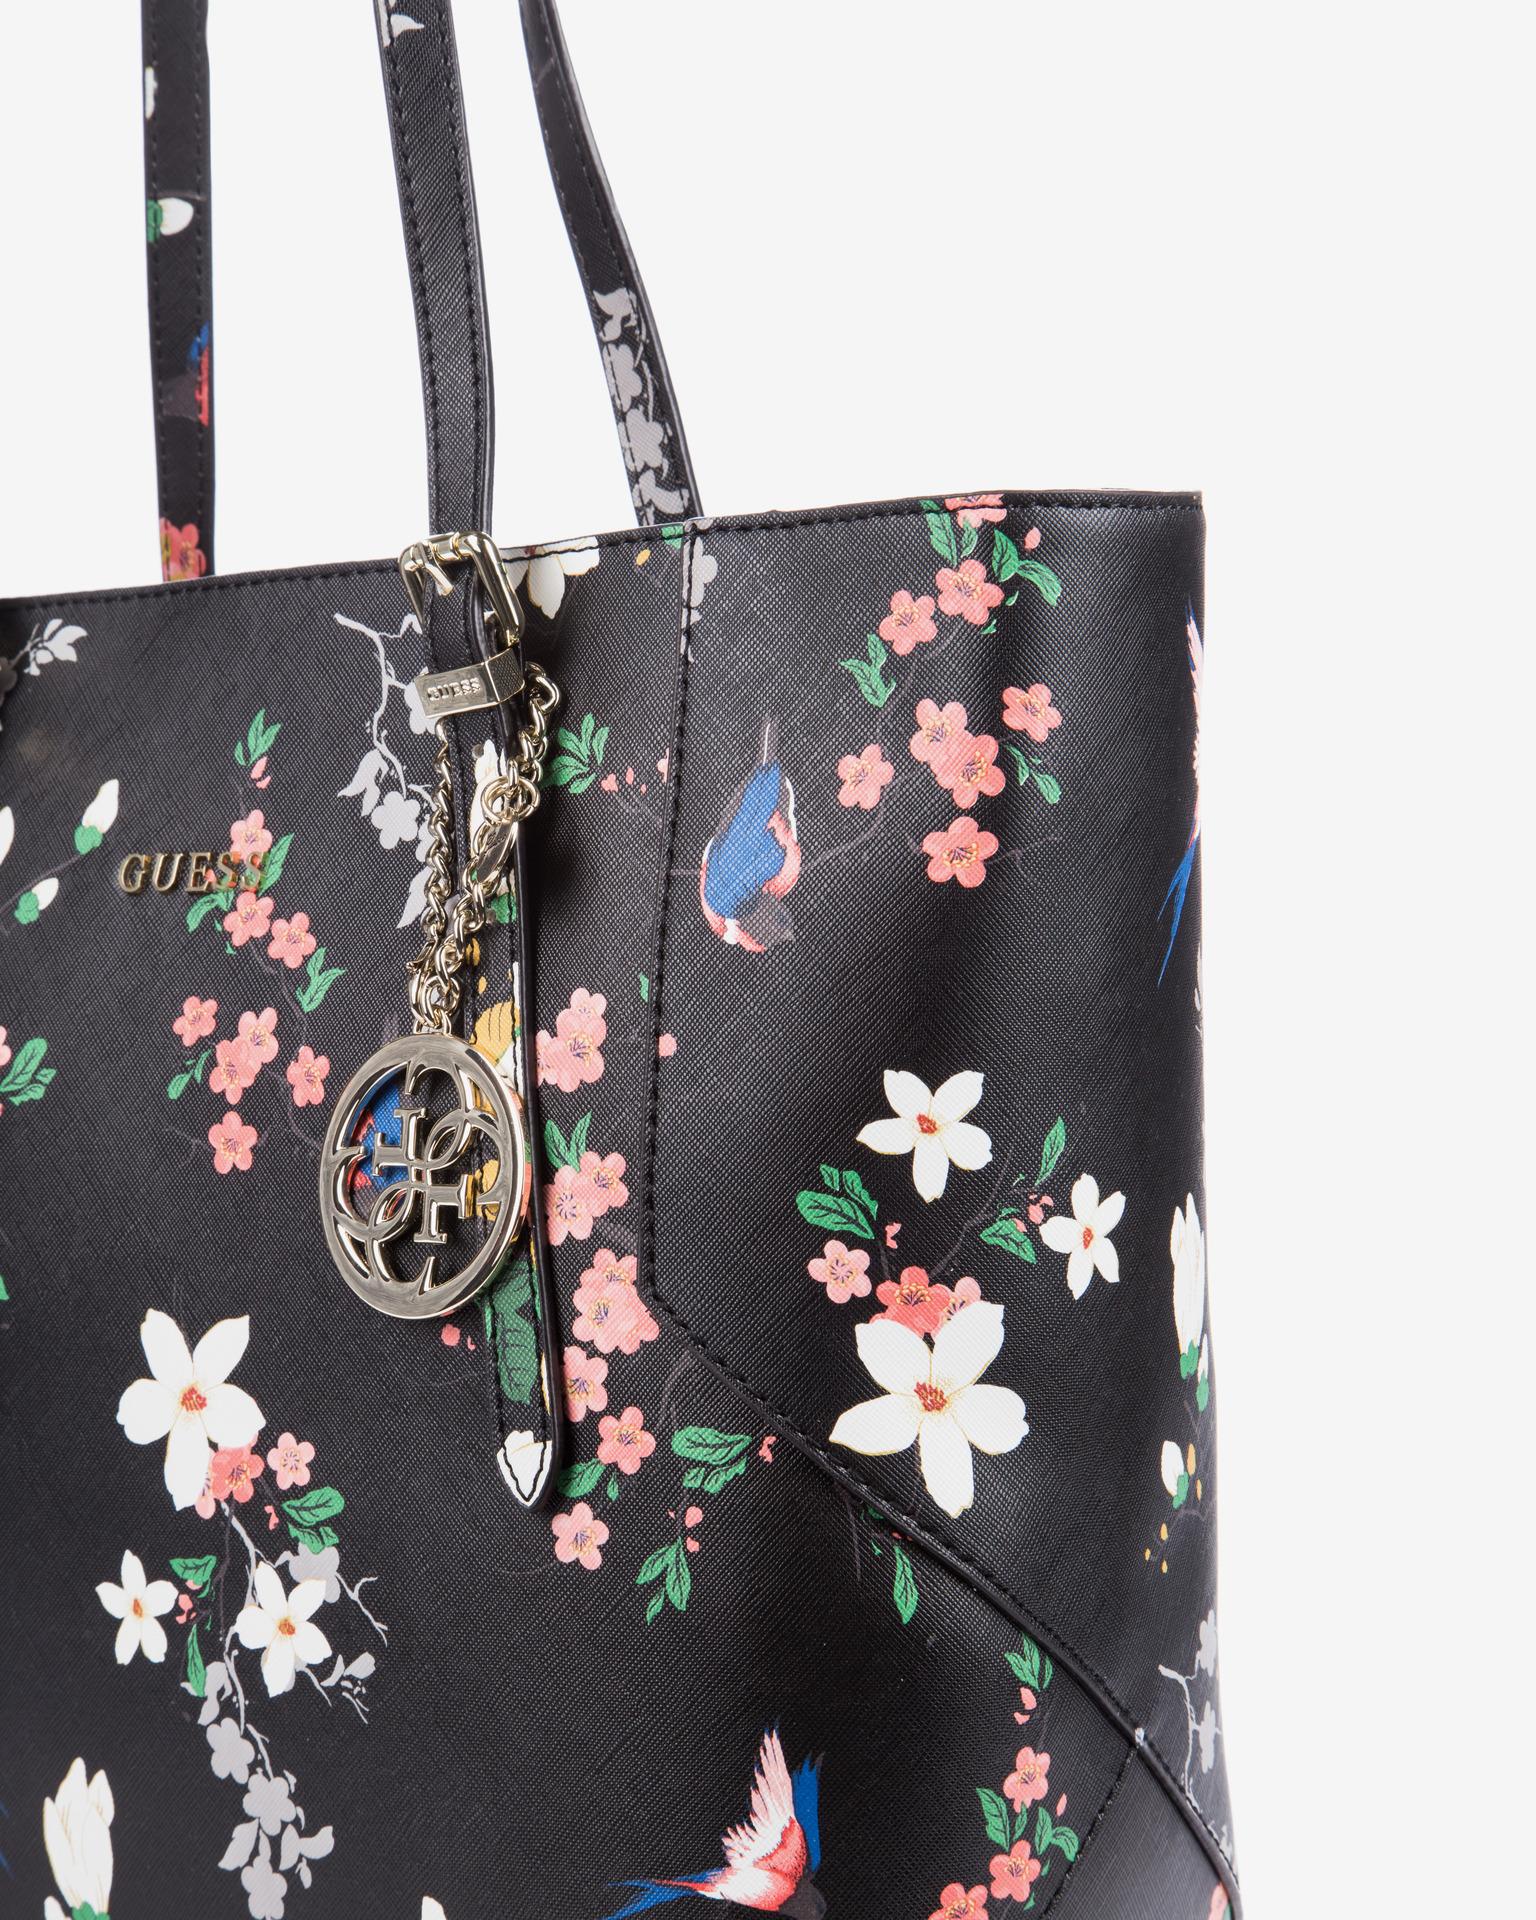 Guess - Isabeau Floral Handbag Bibloo.com